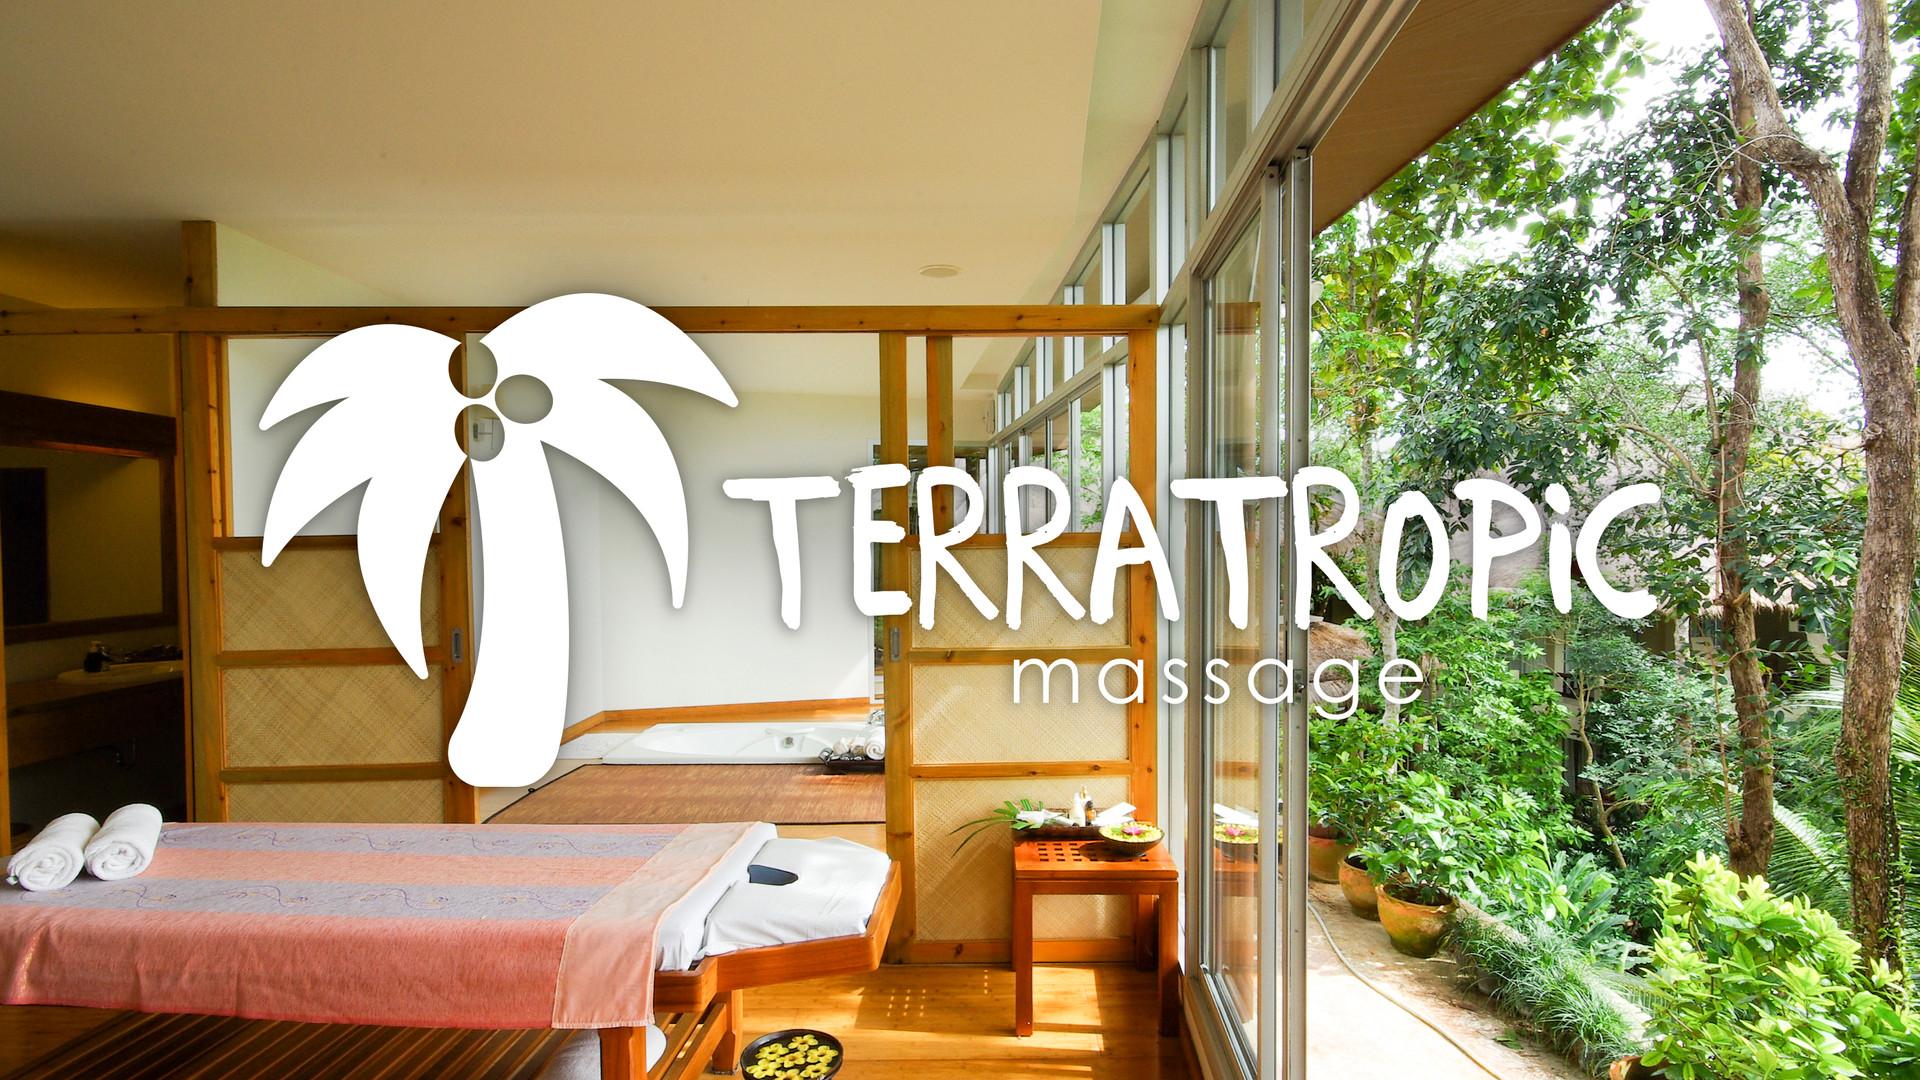 TerraTropic Massage